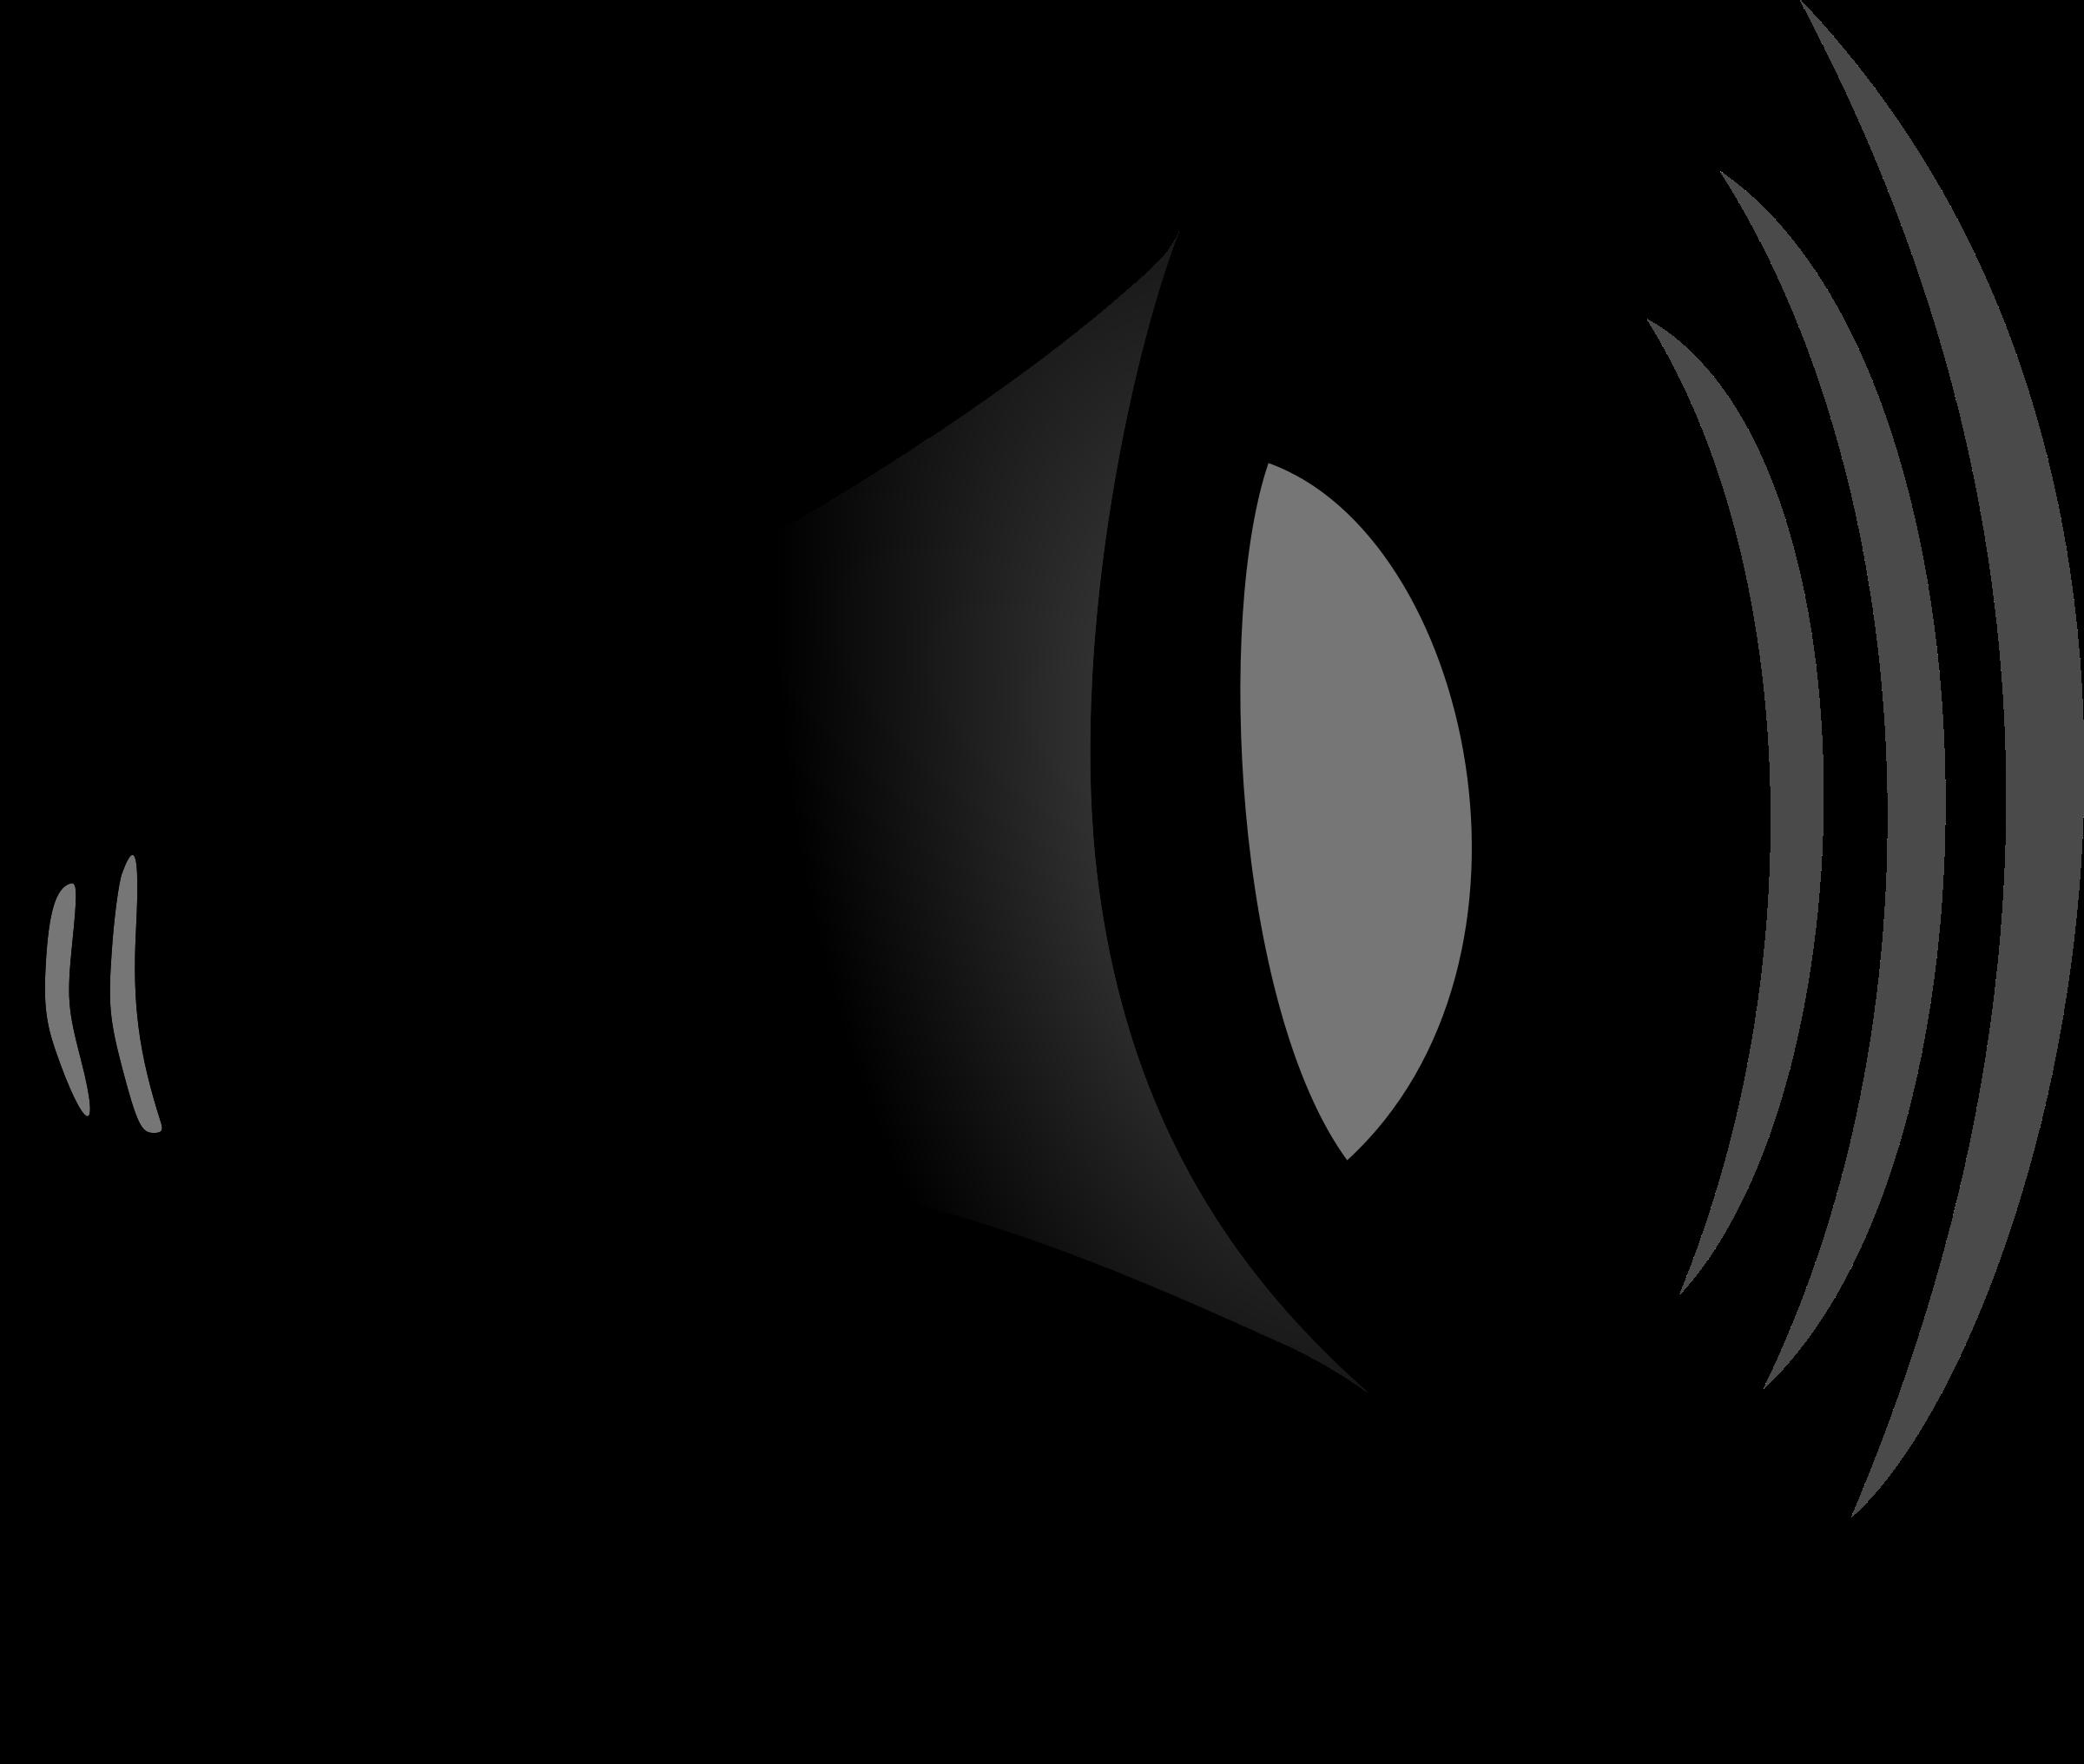 Megaphone cartoon. Image free download best